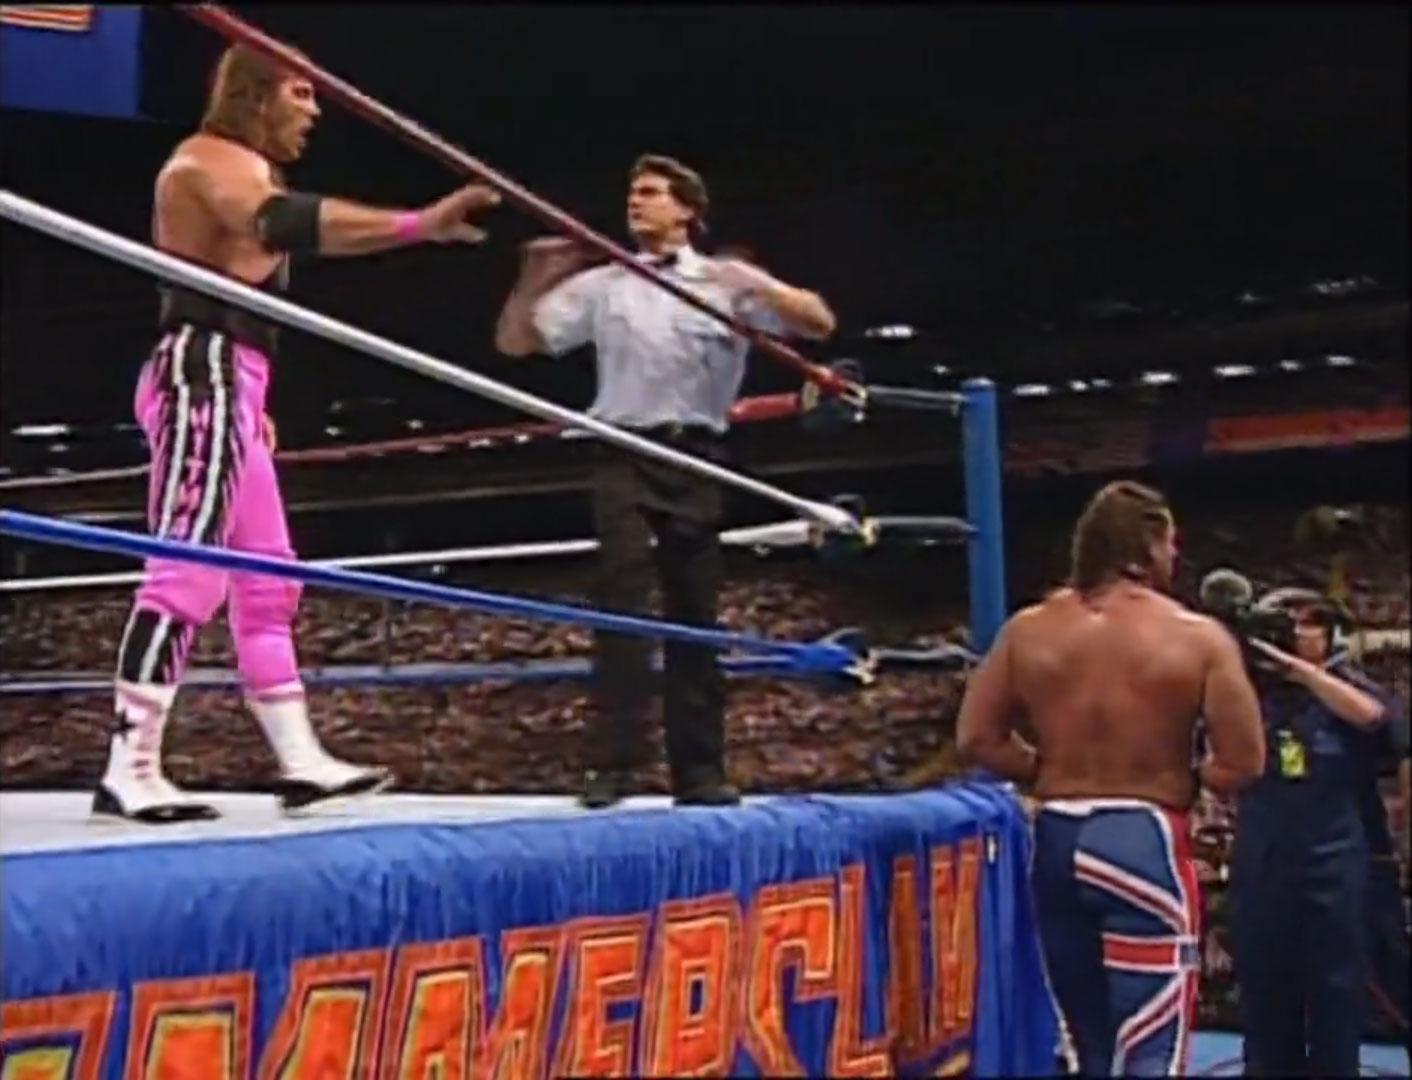 Bret Hart vs. British Bulldog WWF Intercontinental Championship WWF SummerSlam '92, Aug 29th 1992